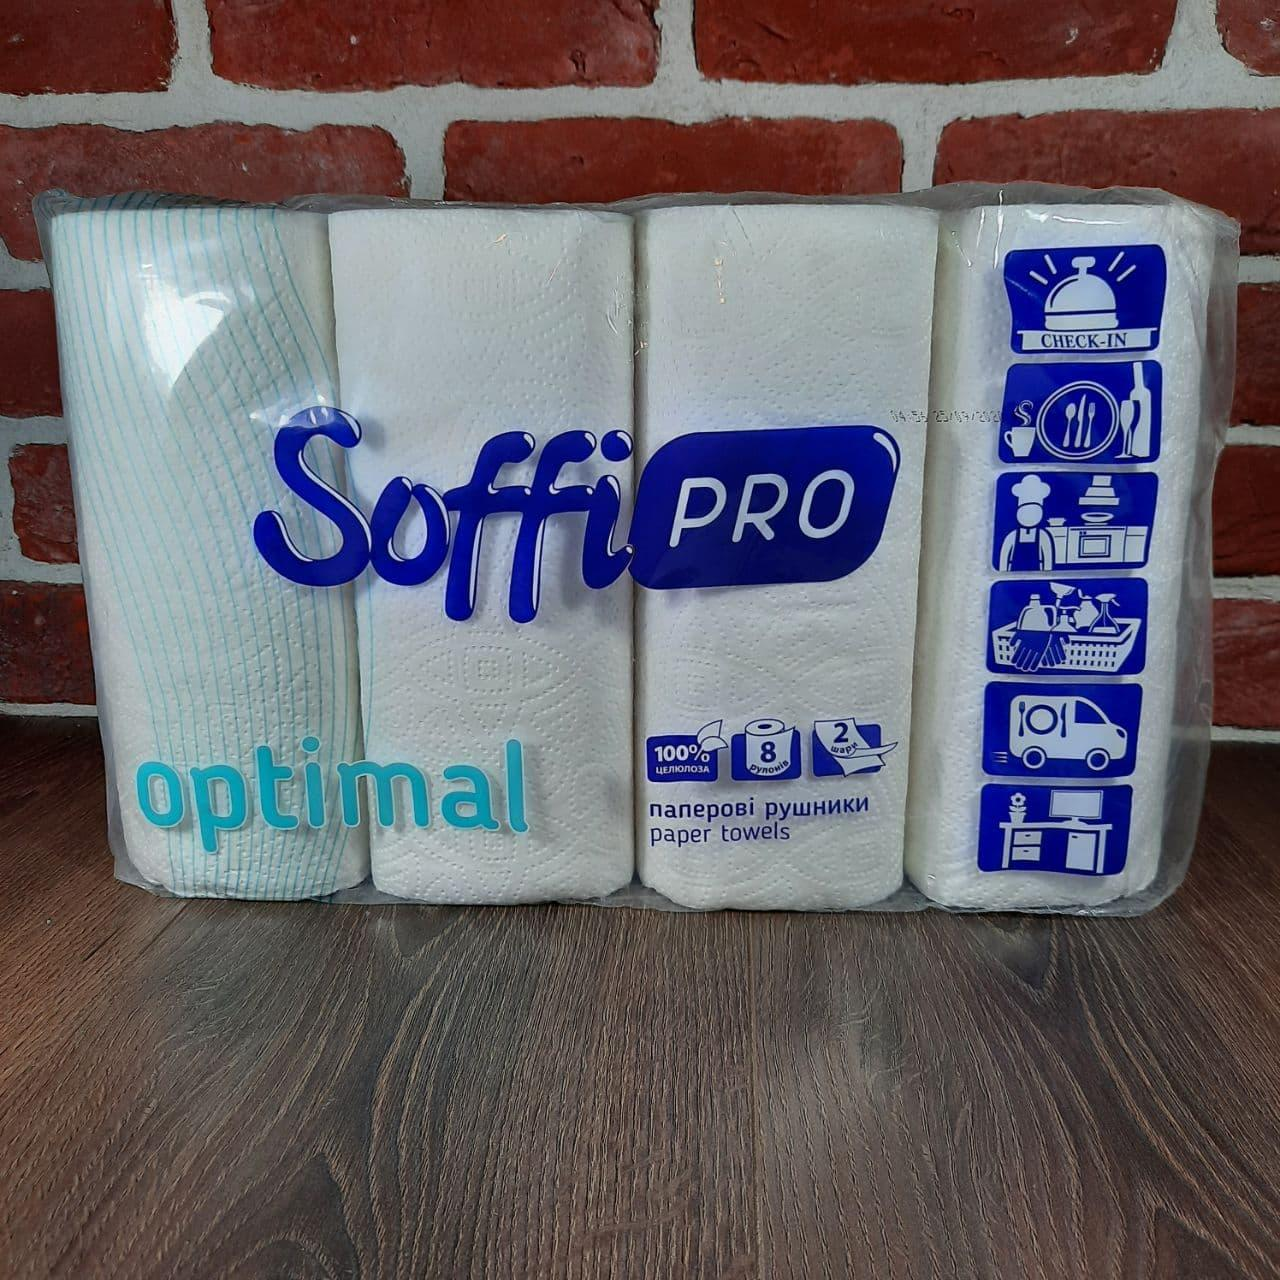 Паперовий рушник (а8) SoffiPRO Optimal (2х шарове) (1 пач.)